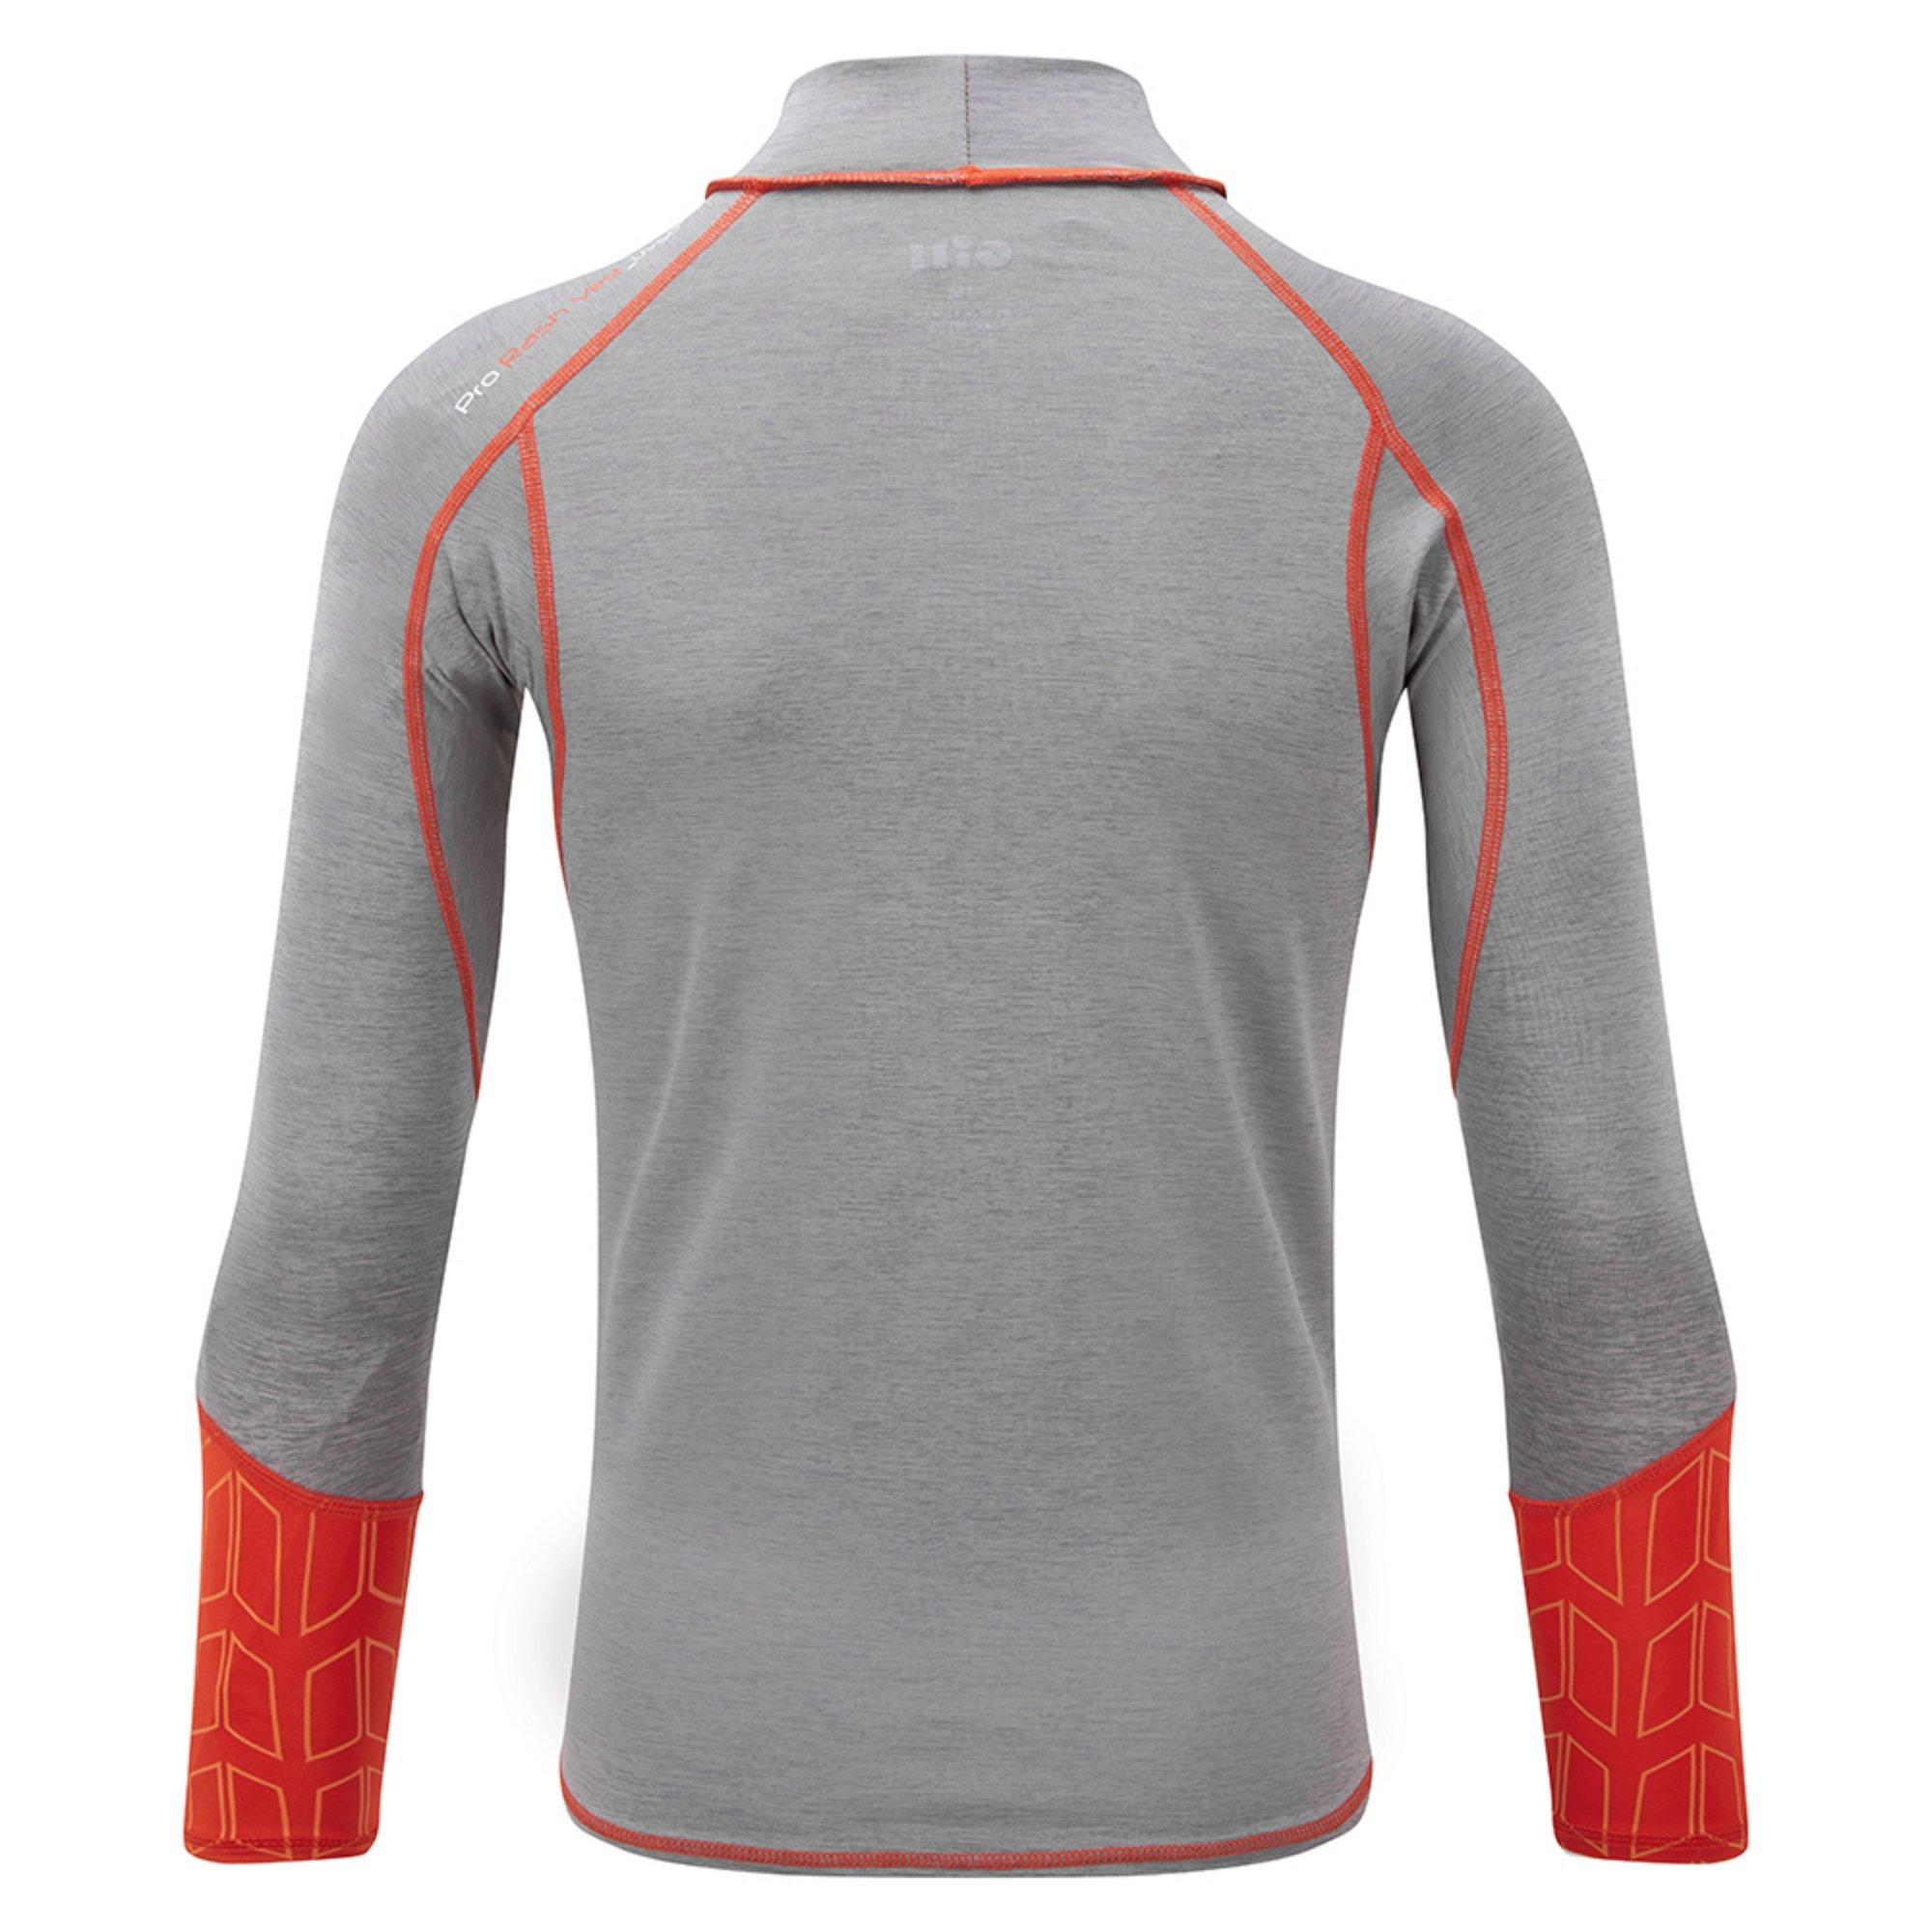 Junior Eco Pro Rash Vest - Long Sleeve - 5025J-GRE18_2.jpg